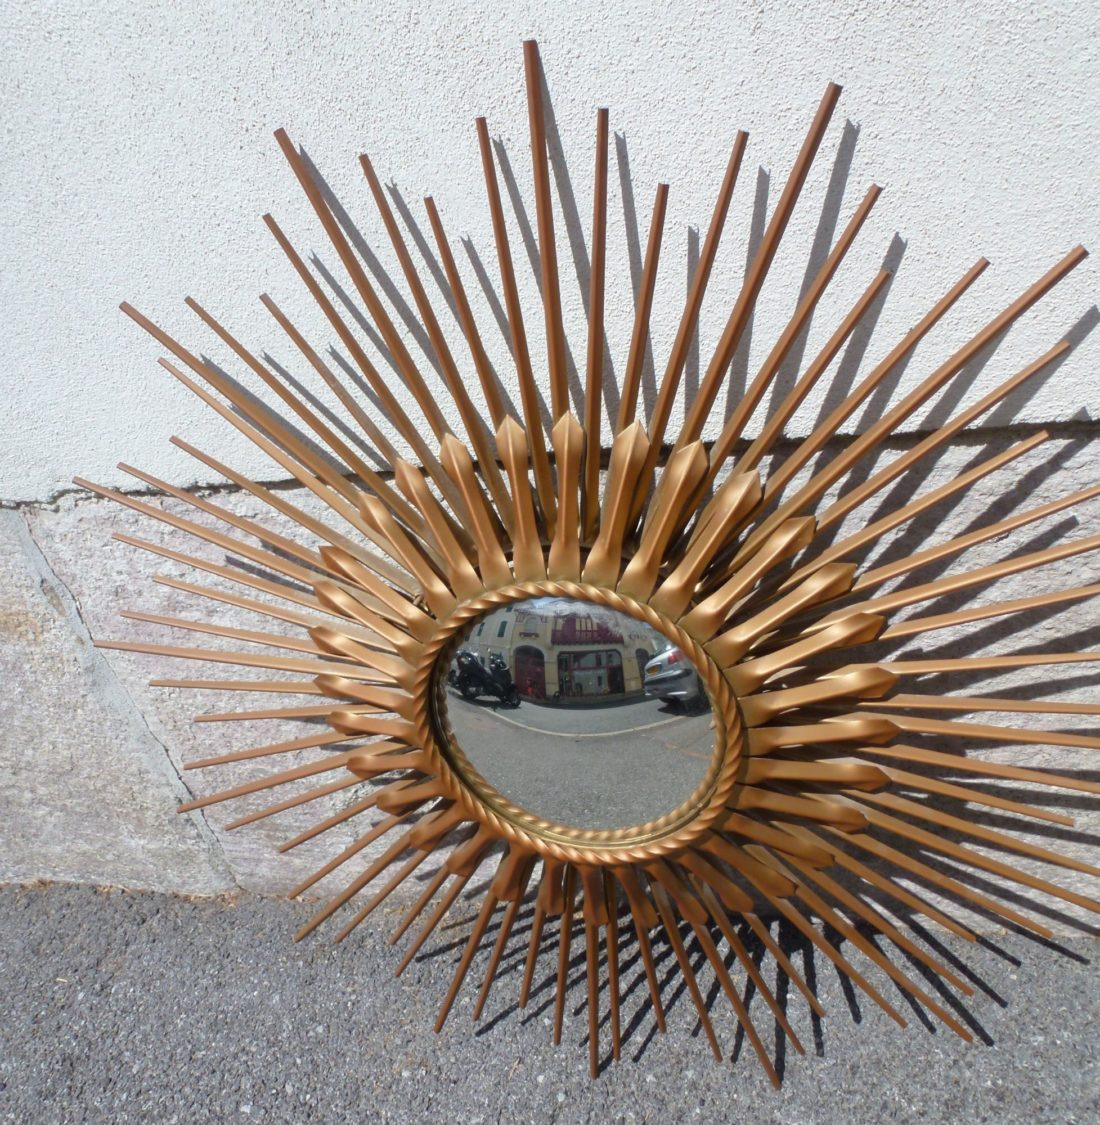 l 39 attrape coeur miroir de sorci re double sign chaty vallaris miroir convexe. Black Bedroom Furniture Sets. Home Design Ideas